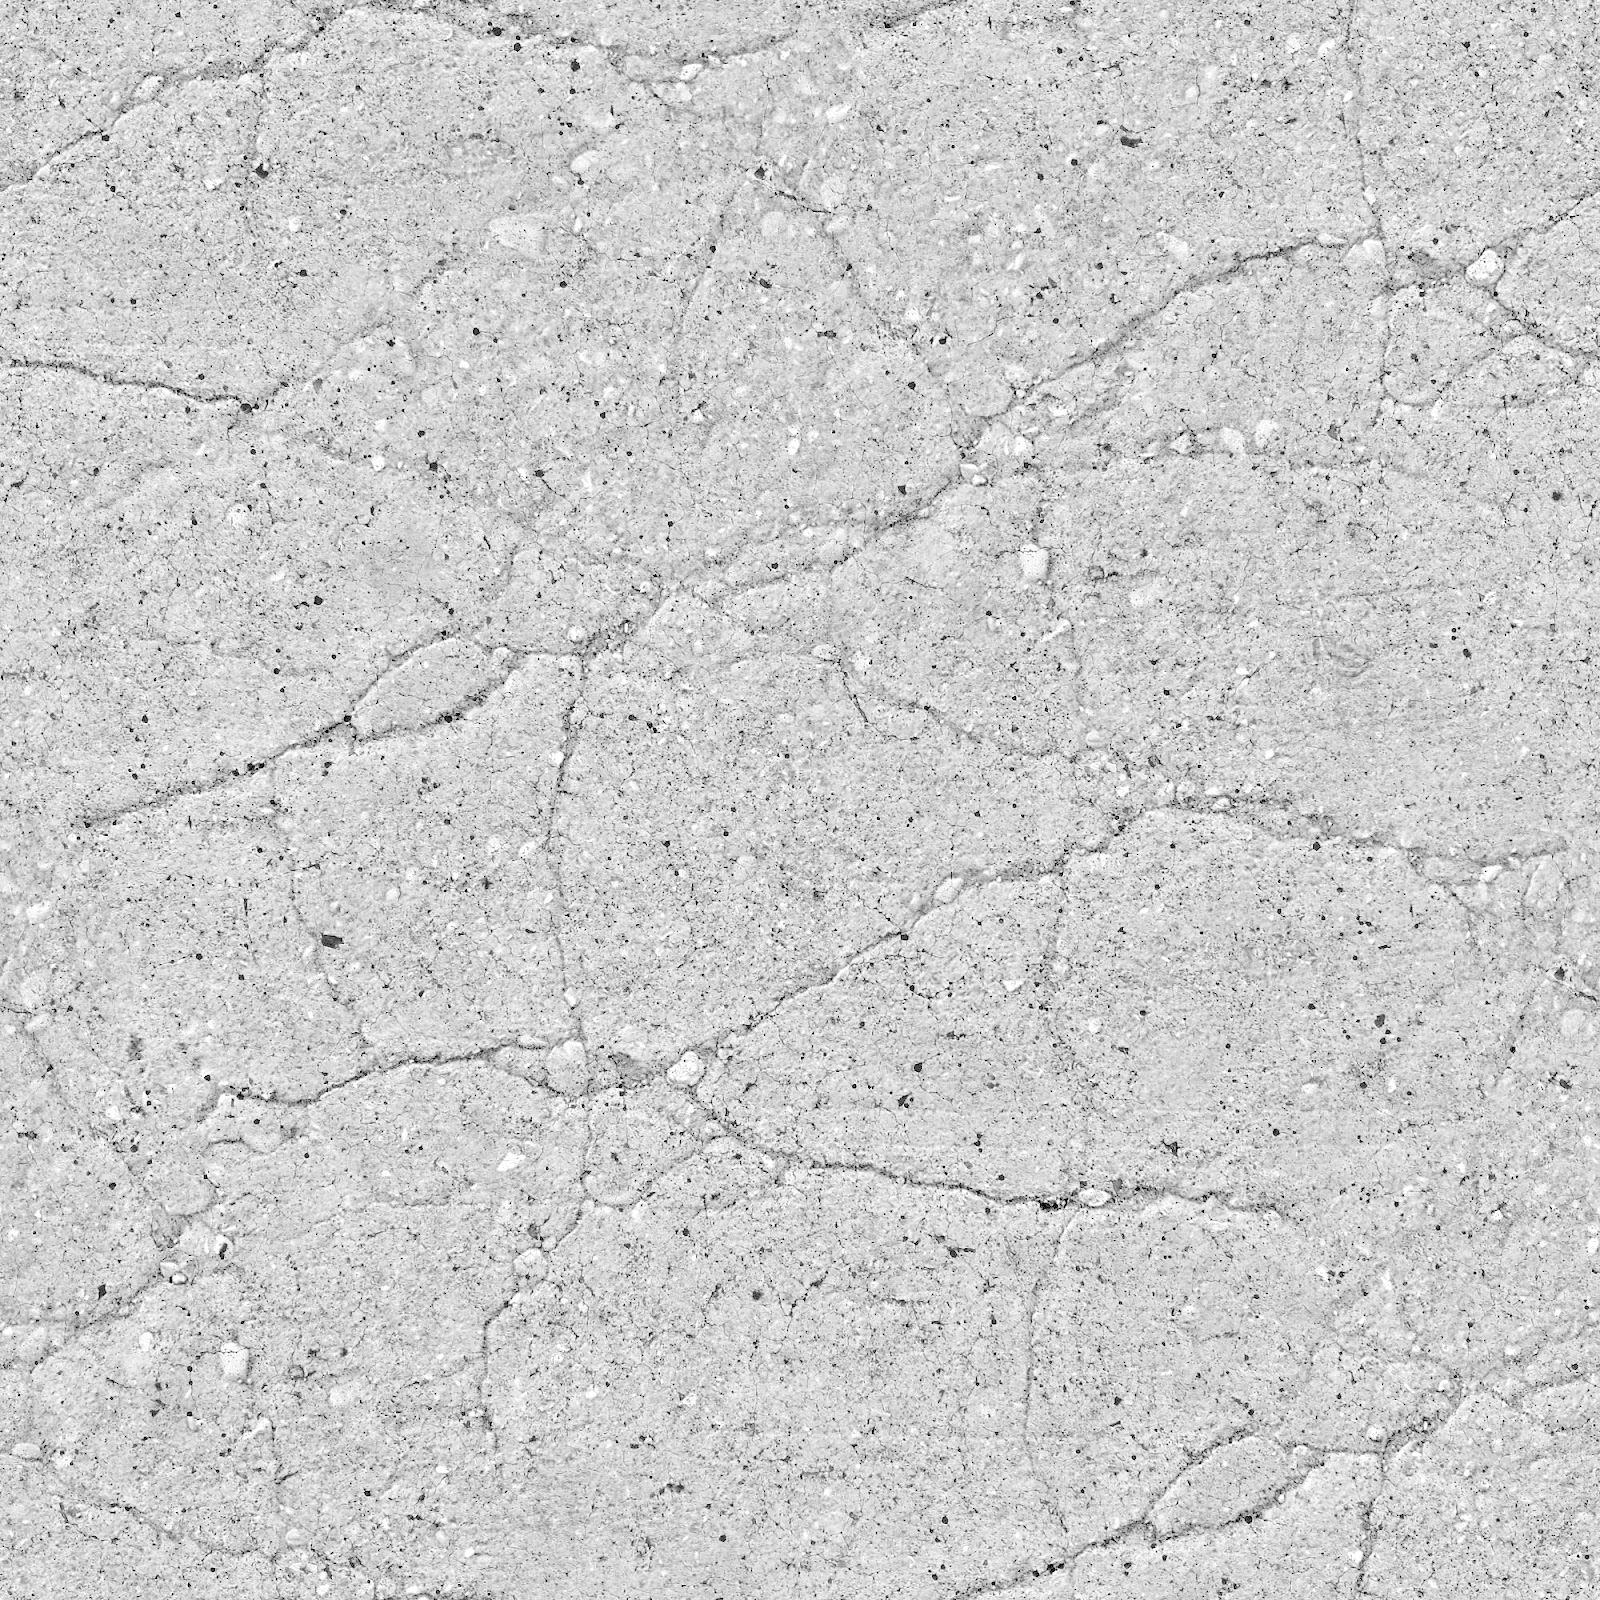 Seamless Concrete Texture 17 B Jpg 1600 215 1600 Seamless